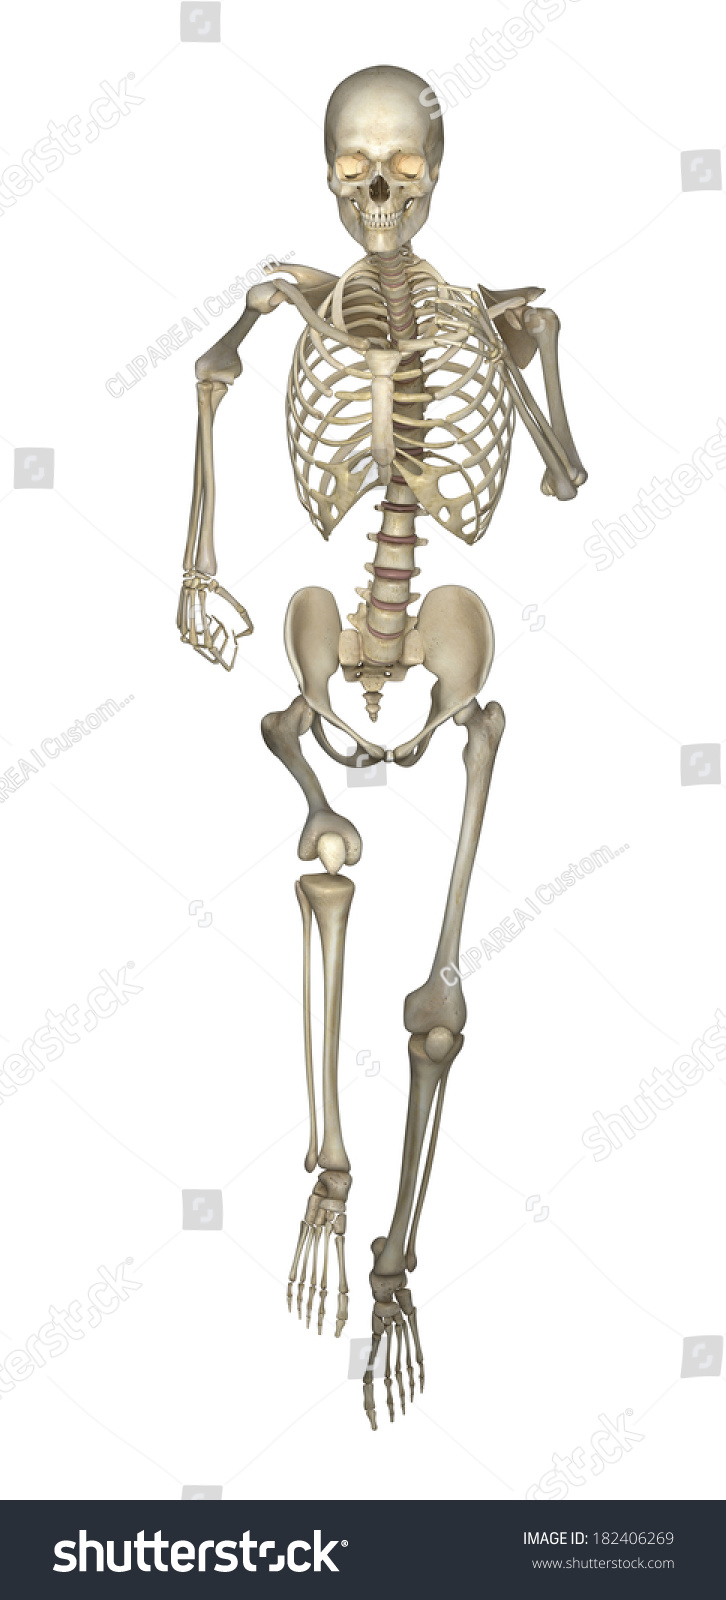 Running Skeleton Anatomy Stock Illustration 182406269 - Shutterstock